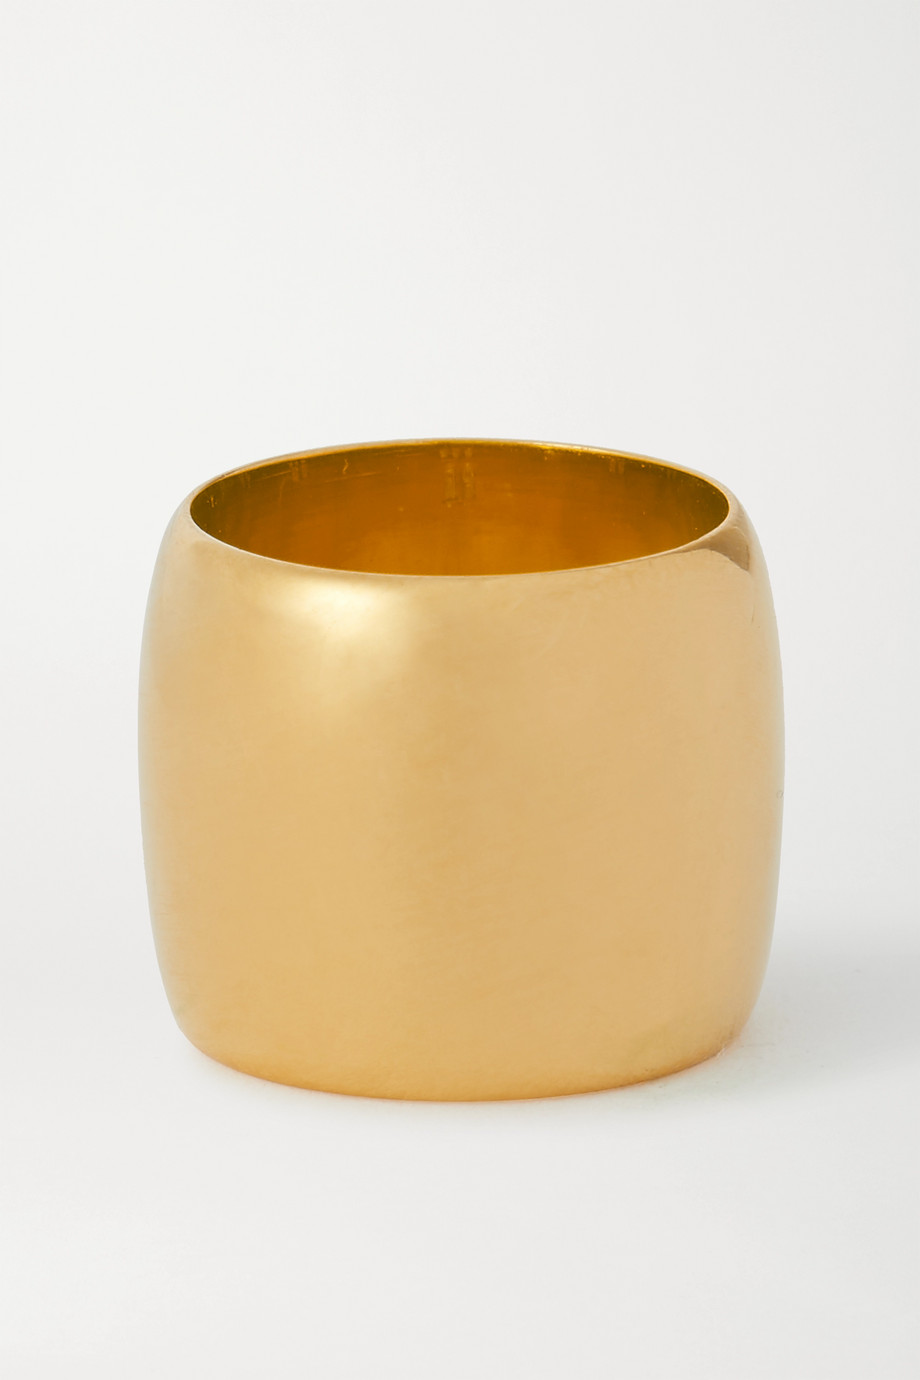 Sophie Buhai Cigar gold vermeil ring